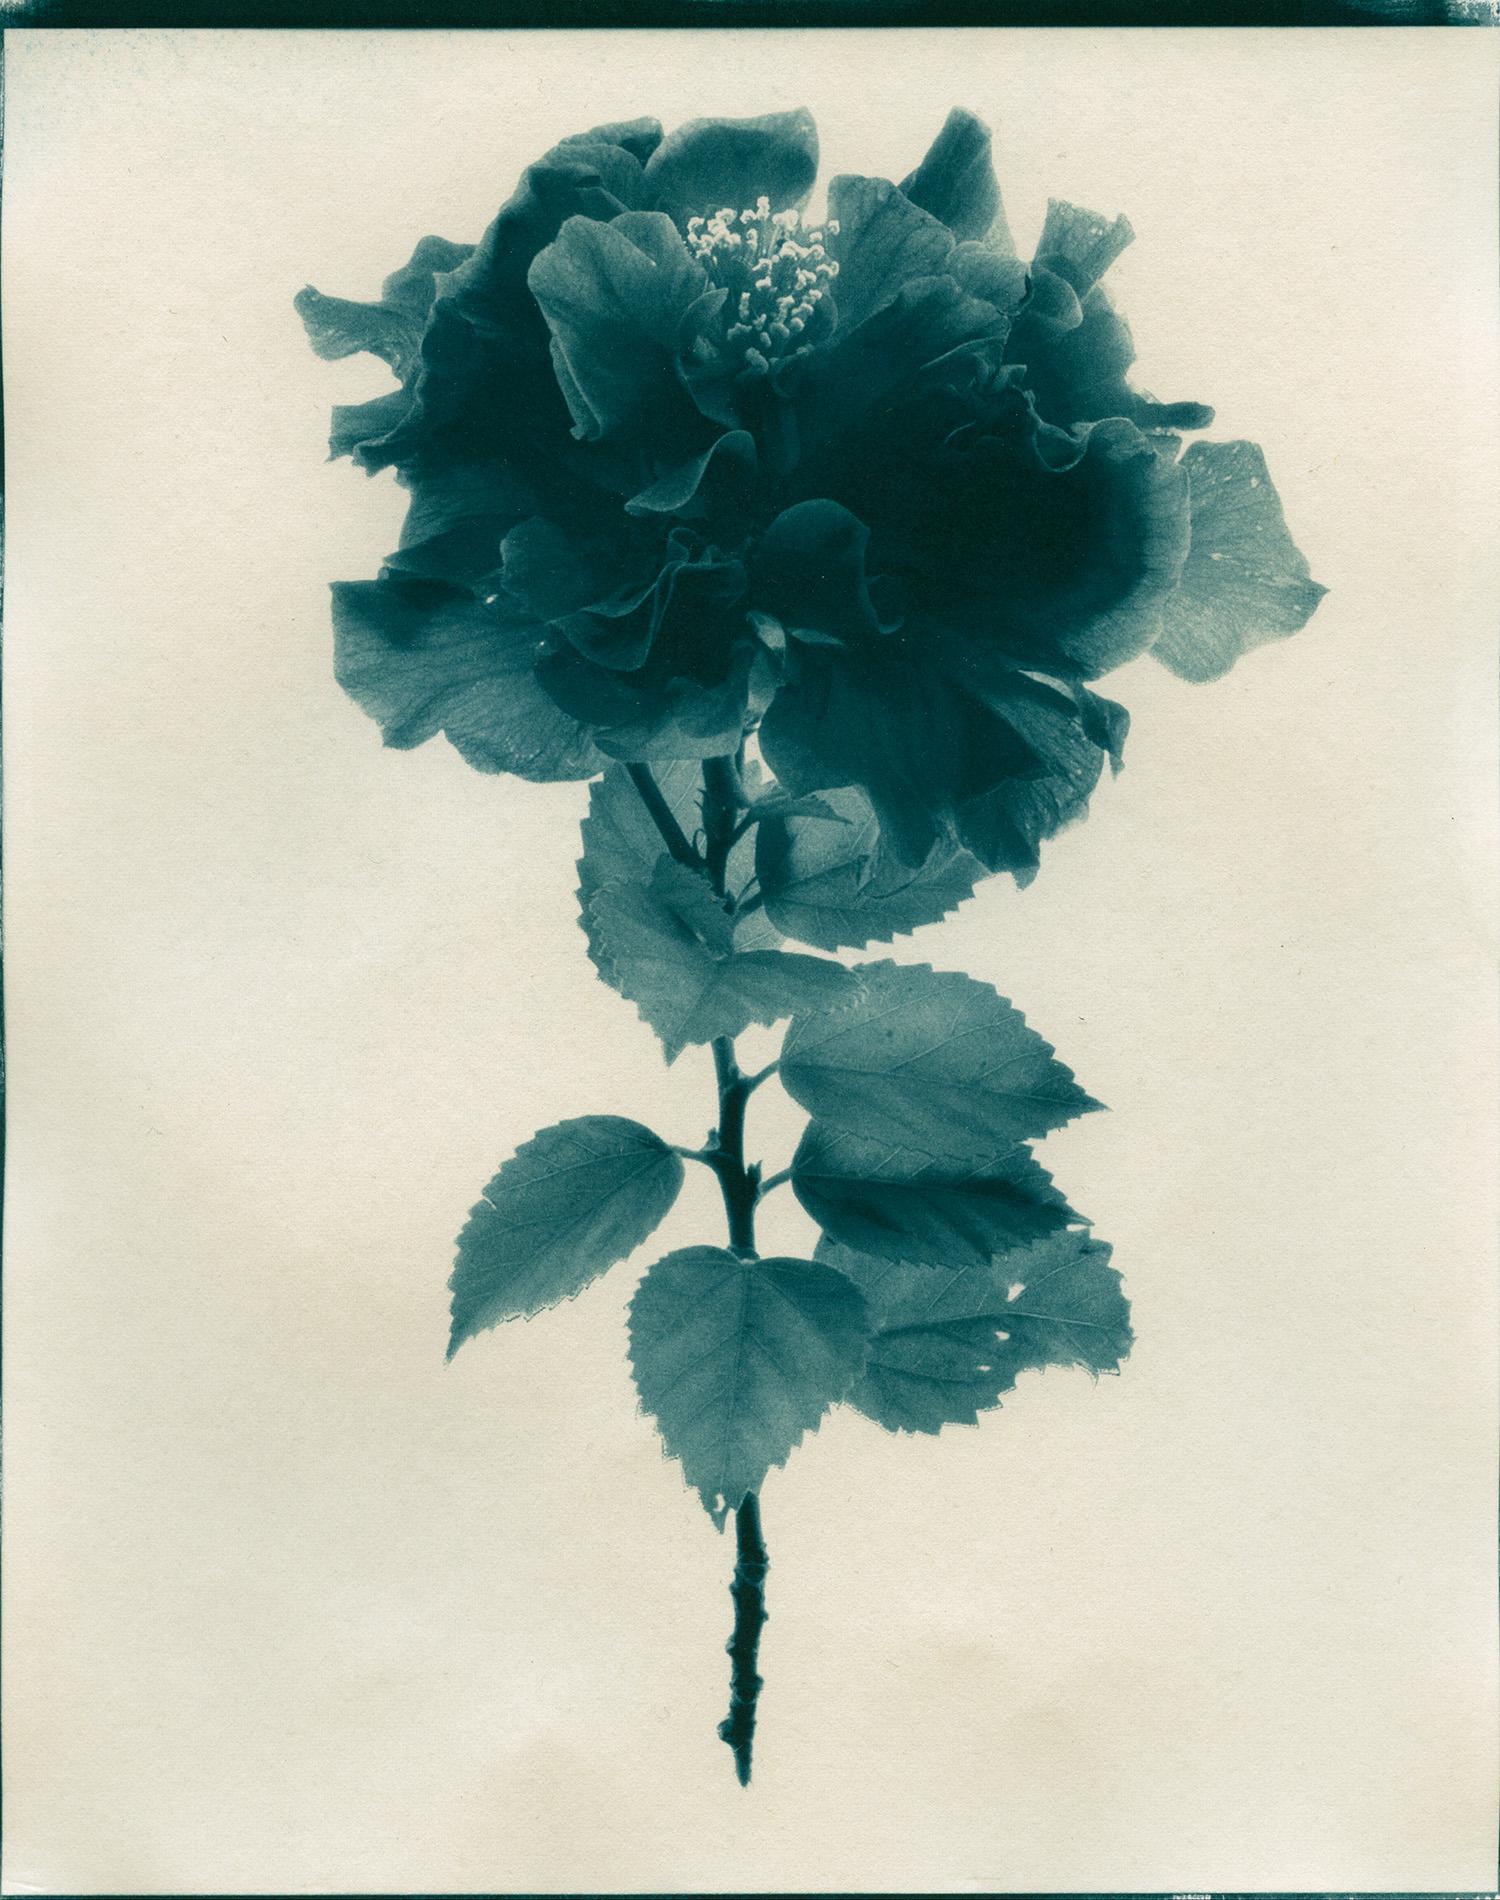 Cyan-Camellia-1900x1500x72dpi-Sq.jpg